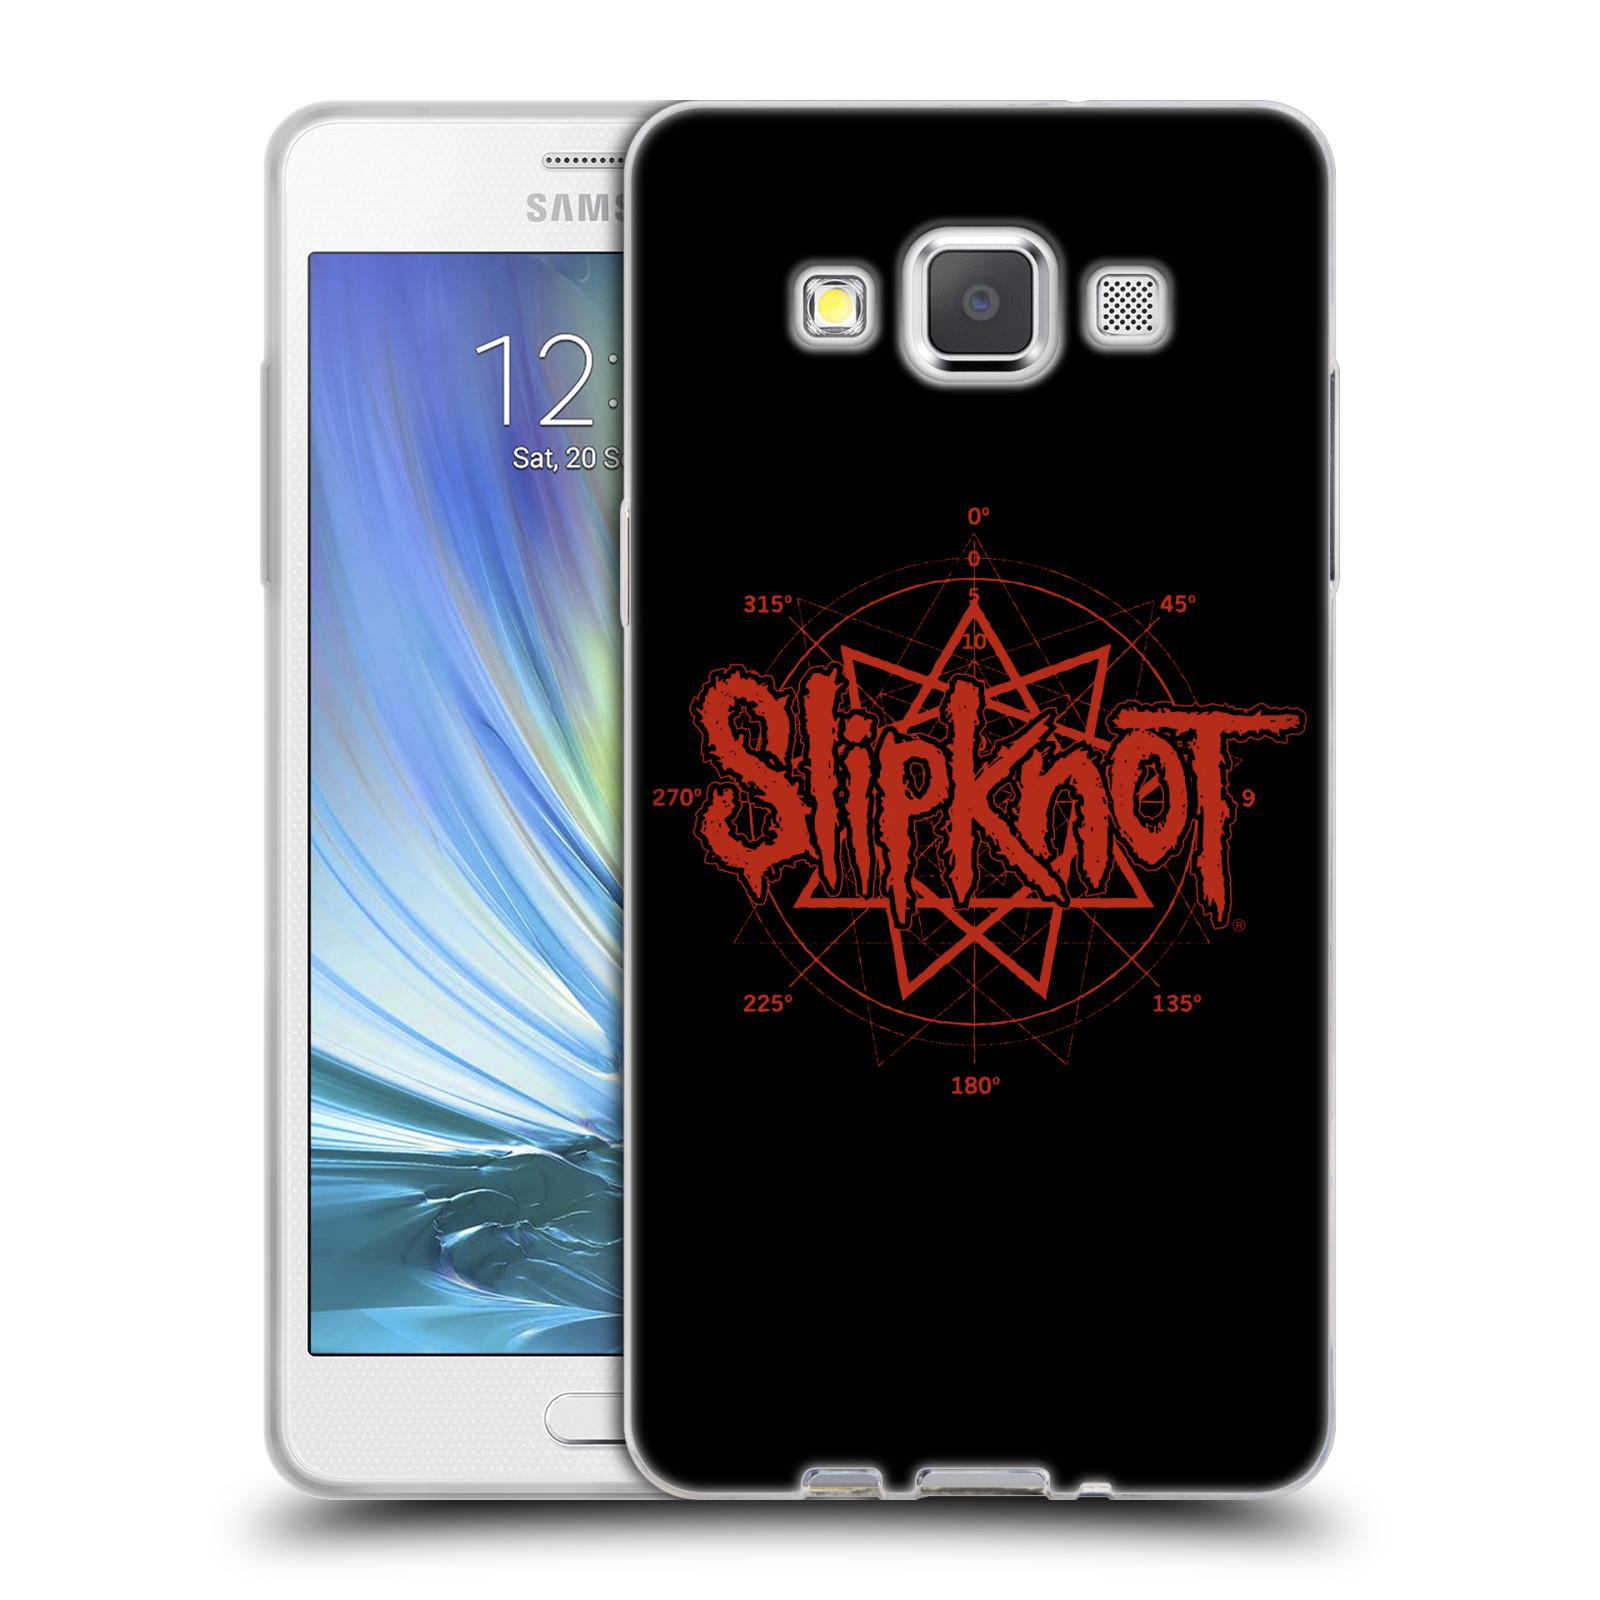 HEAD CASE silikonový obal na mobil Samsung Galaxy A5 (A500) hudební skupina Slipknot logo